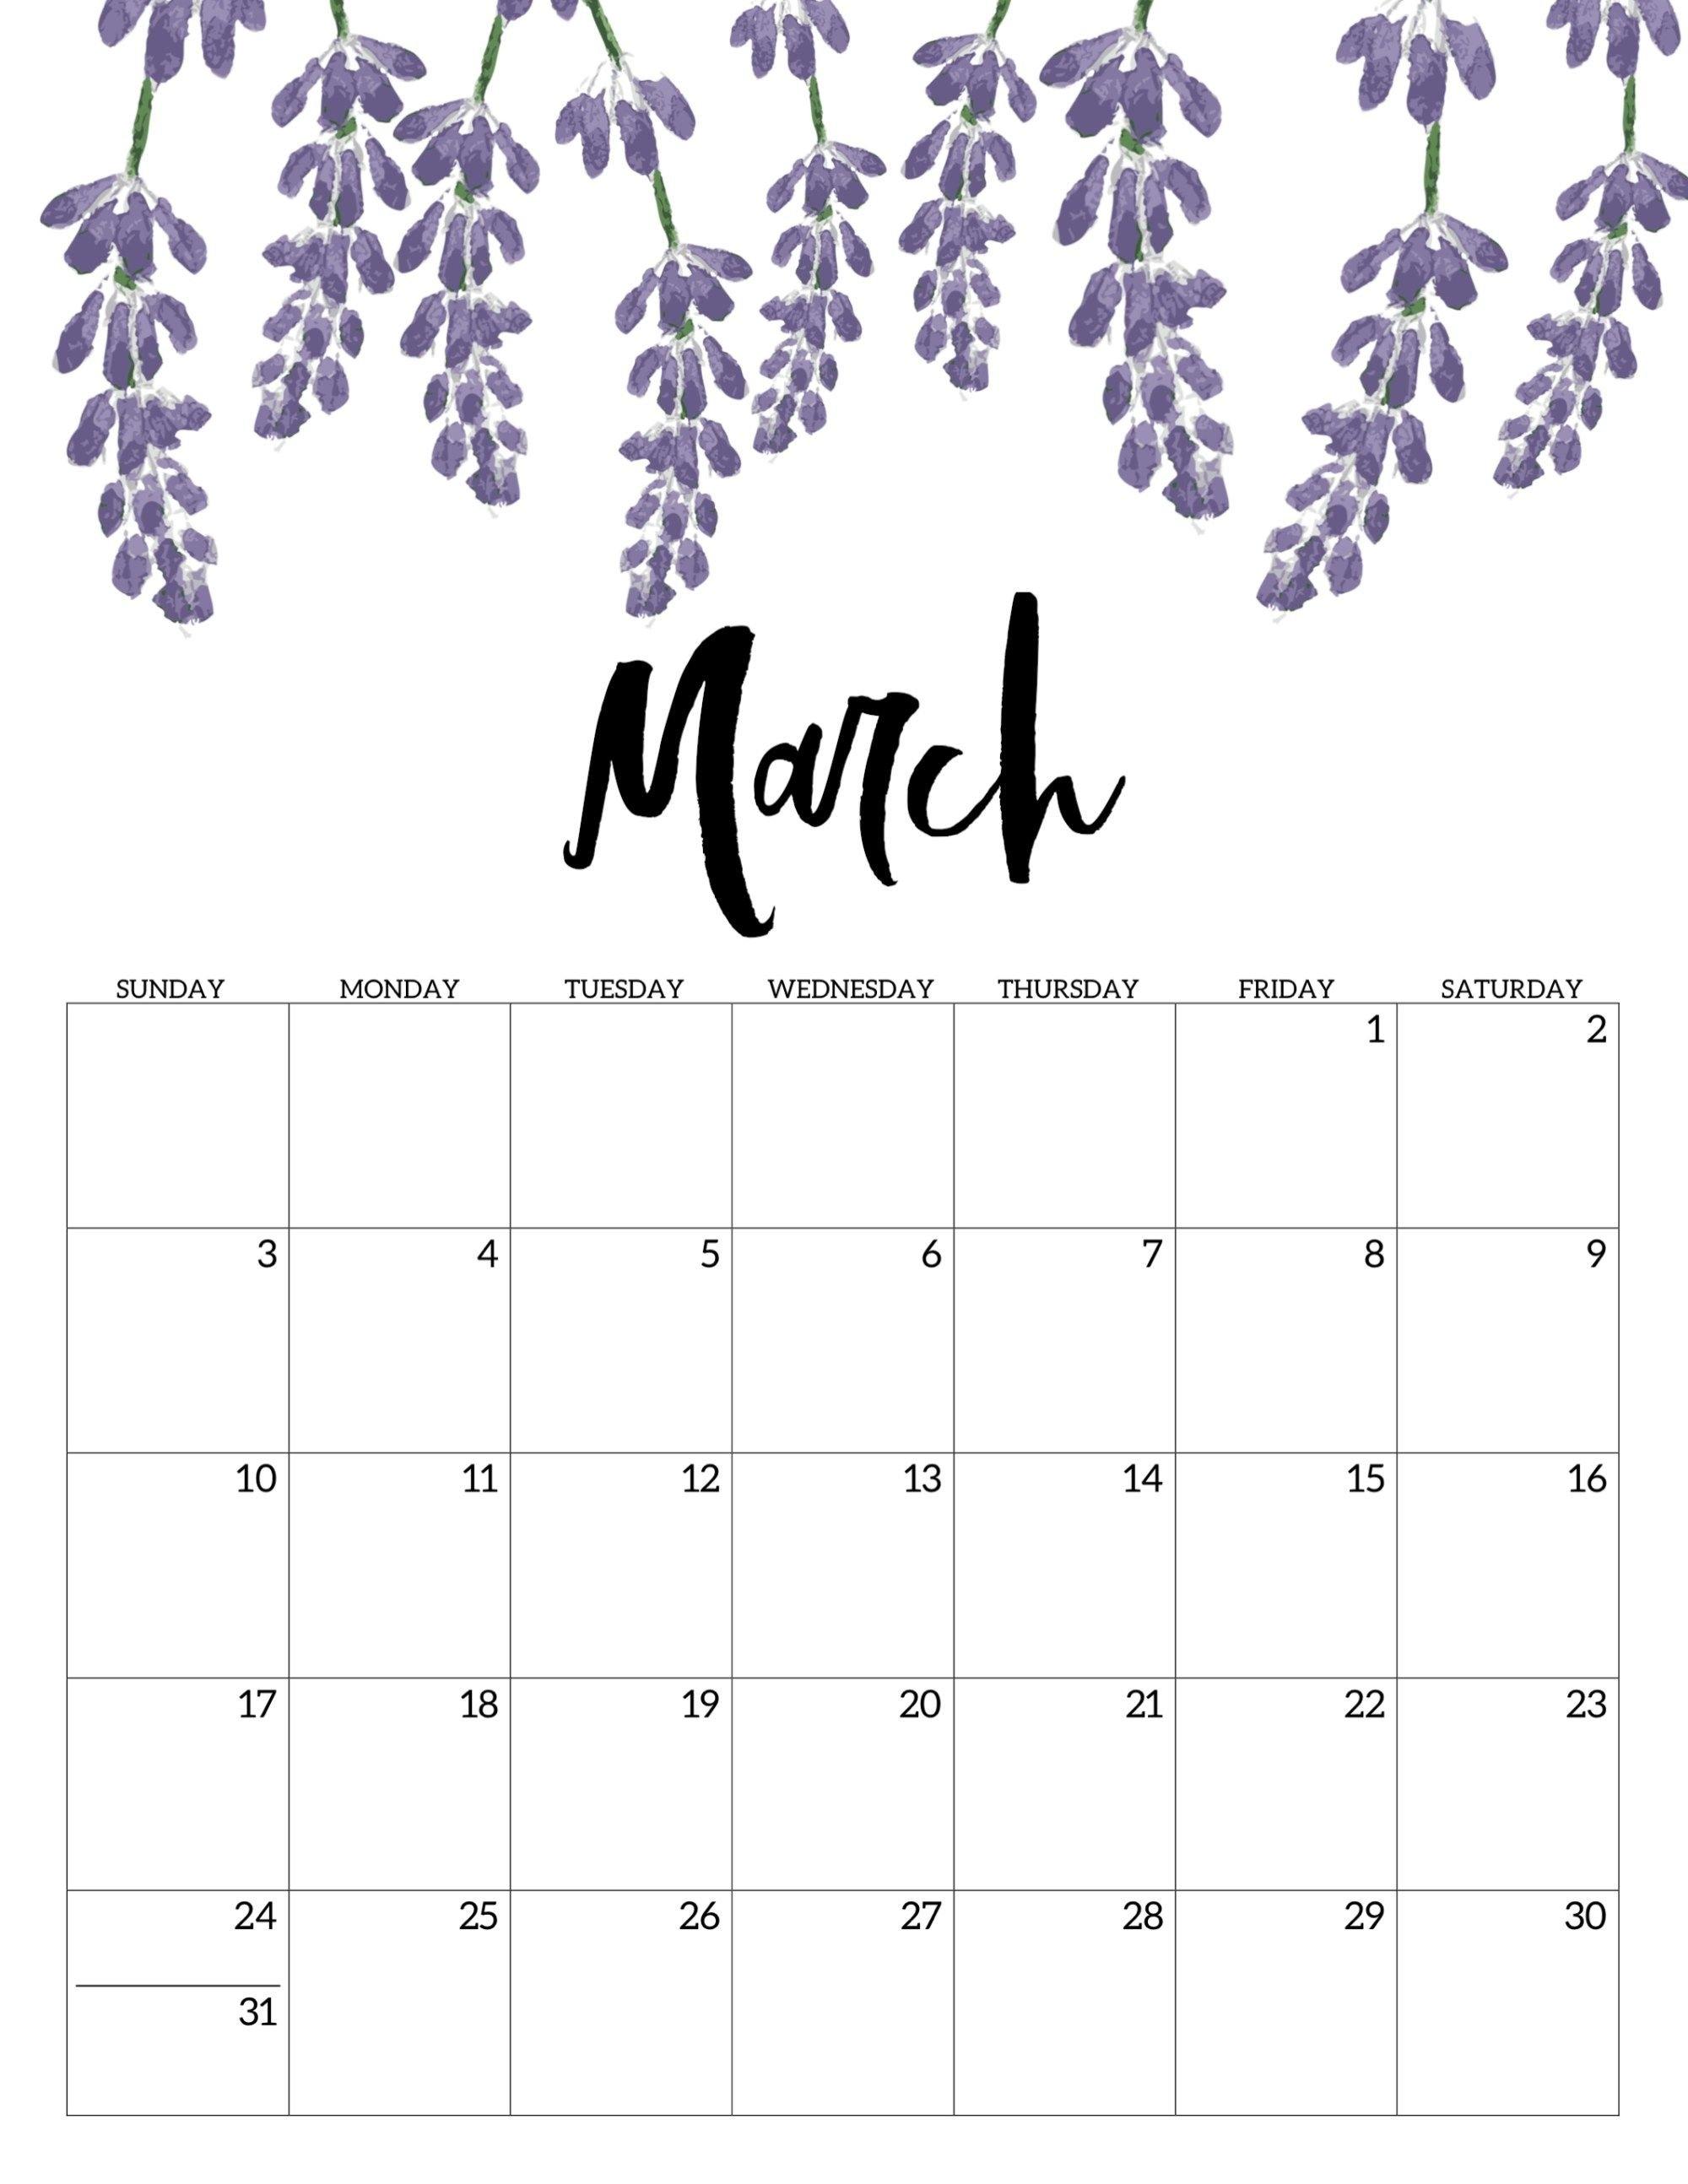 Free Printable Calendar 2019 – Floral | Calendar | Calendar, Free Print A Calendar 2019 Free